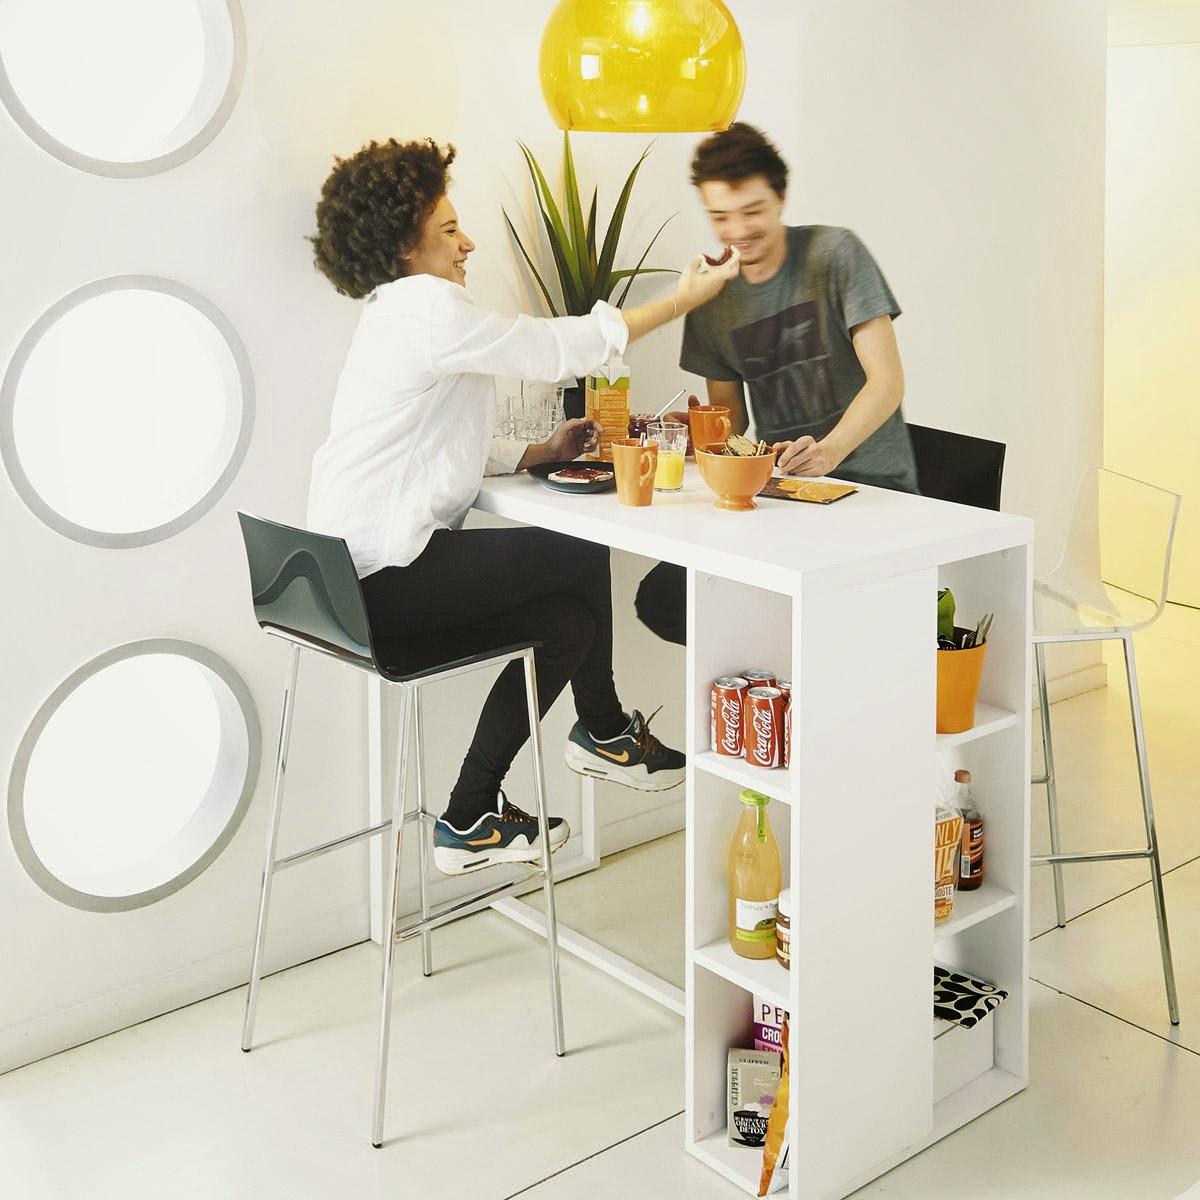 initiales gg nouvelle collection maisons du monde. Black Bedroom Furniture Sets. Home Design Ideas